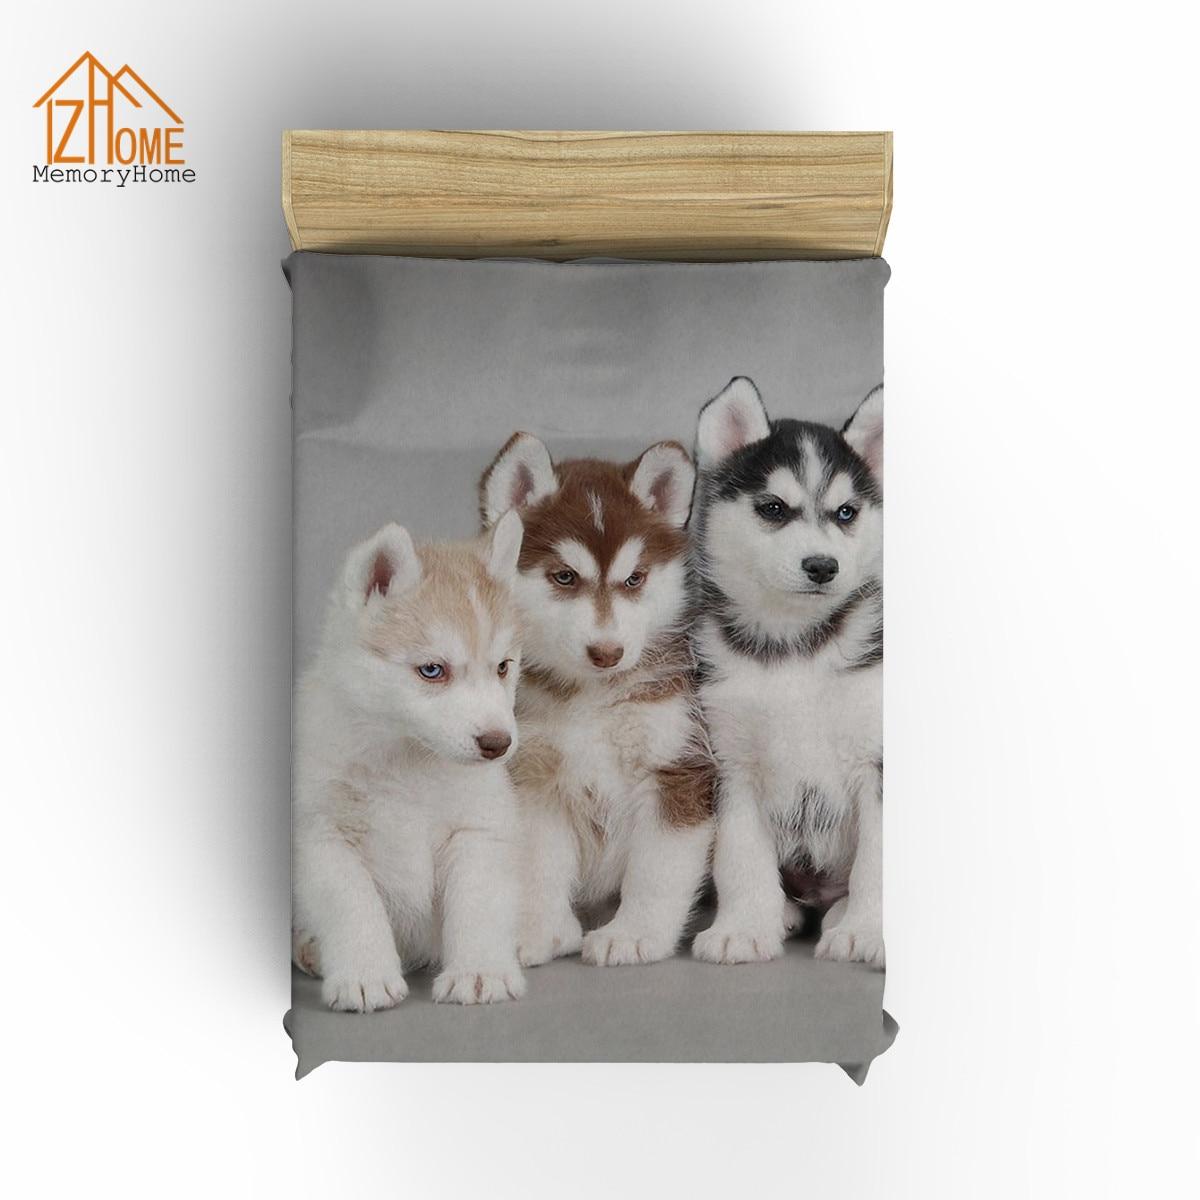 US $20.34 45% OFF Memory Home Siberian Husky Puppies Dogs Pets Coral Fleece  Fabric Blanket Sofa Bed Throw Blanket Kid Adult Blanket Best Gift-in ...